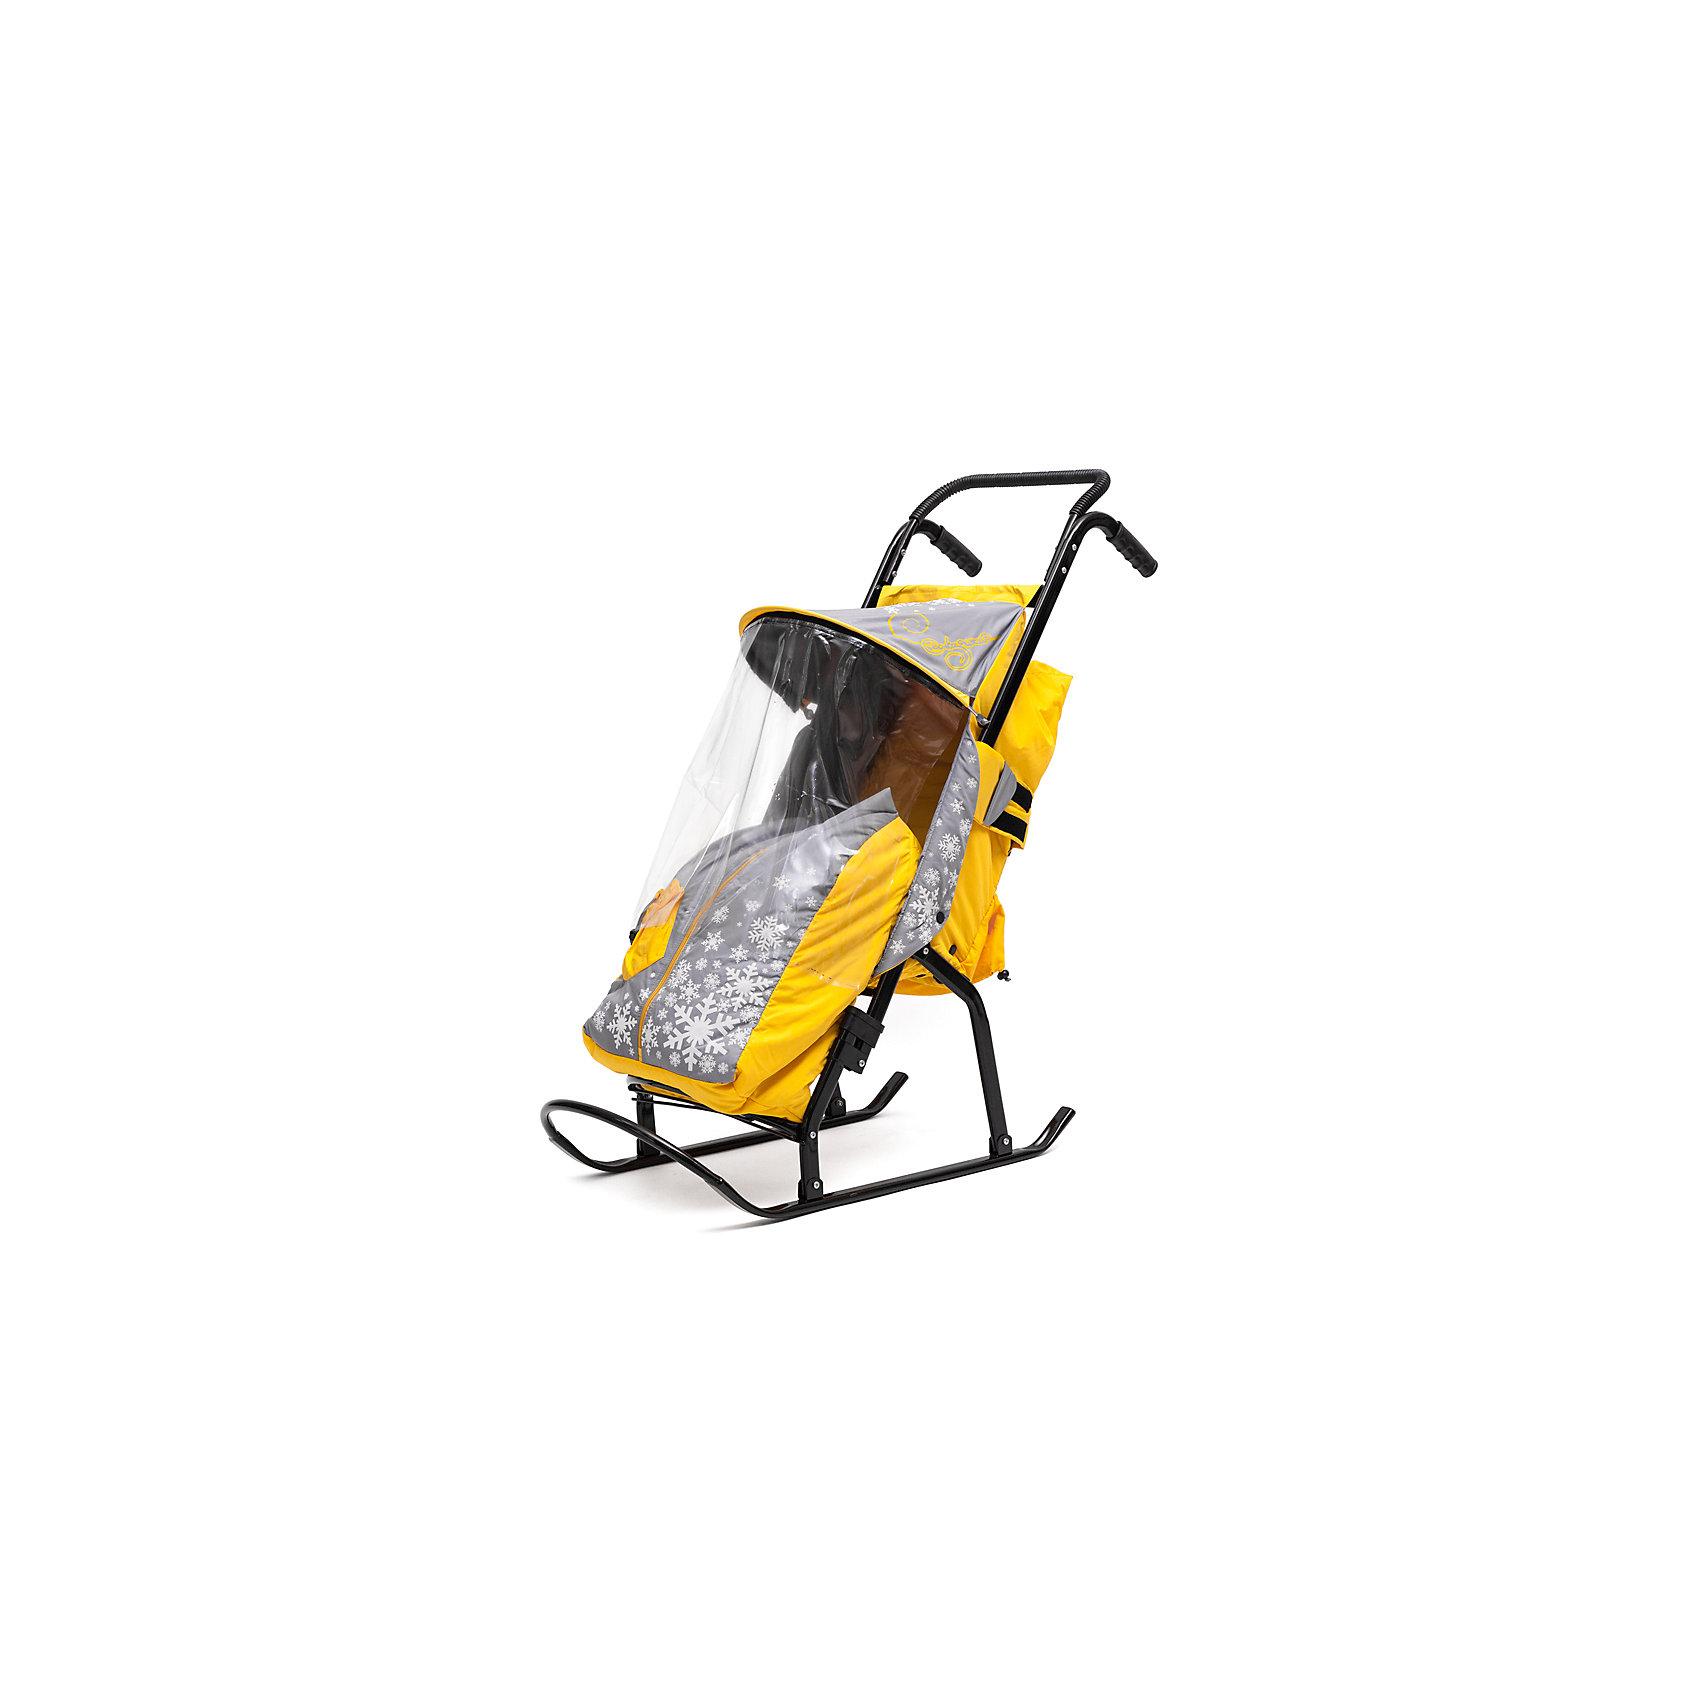 Санки-коляска Снегурочка 2-Р1, Скользяшки, серый-желтый